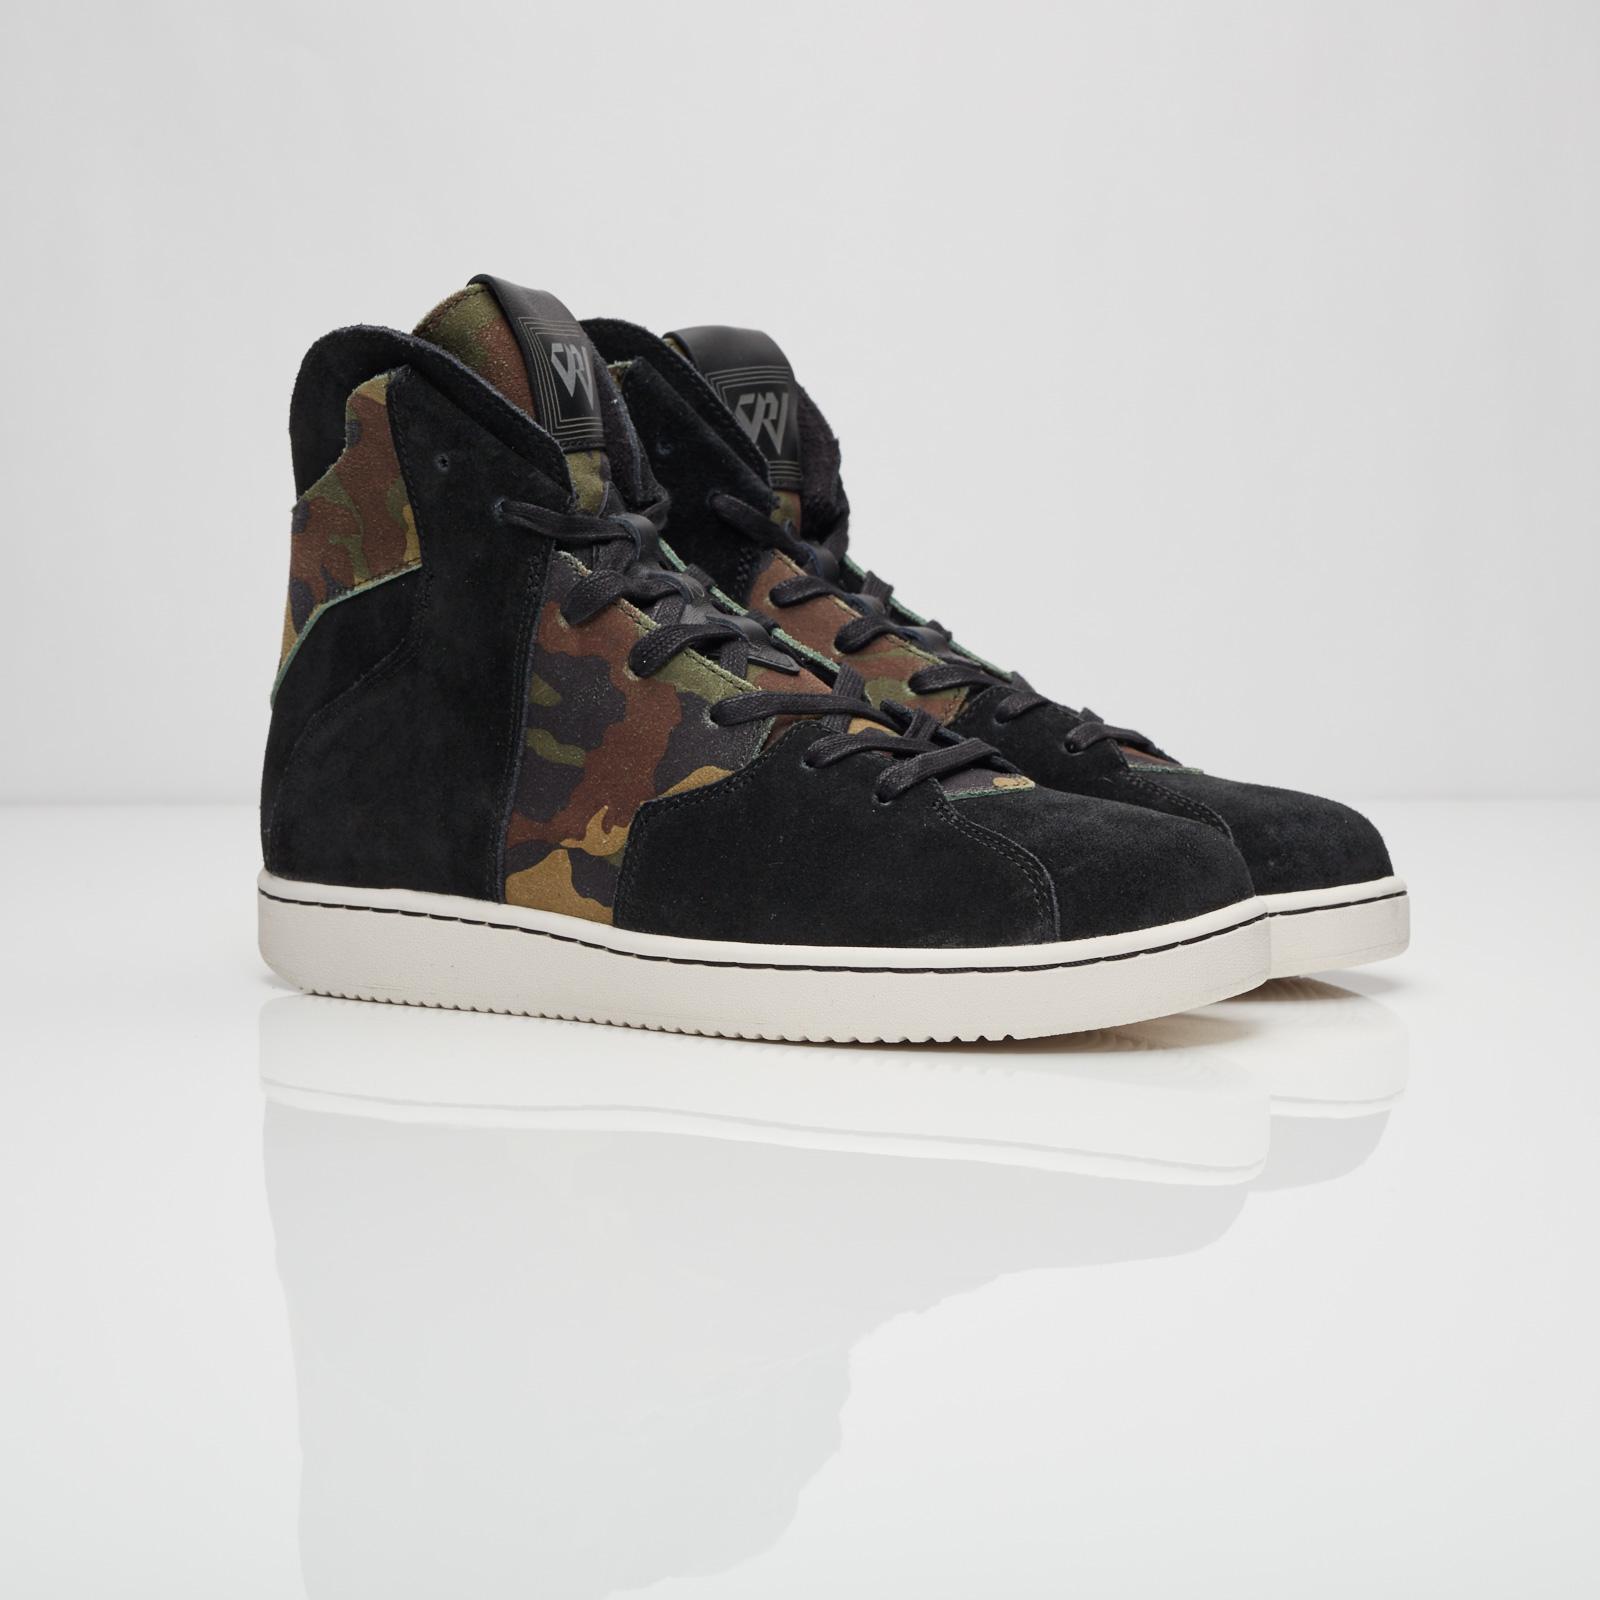 e92403e0f91d6 Jordan Brand Jordan Westbrook 0.2 - 854563-003 - Sneakersnstuff ...